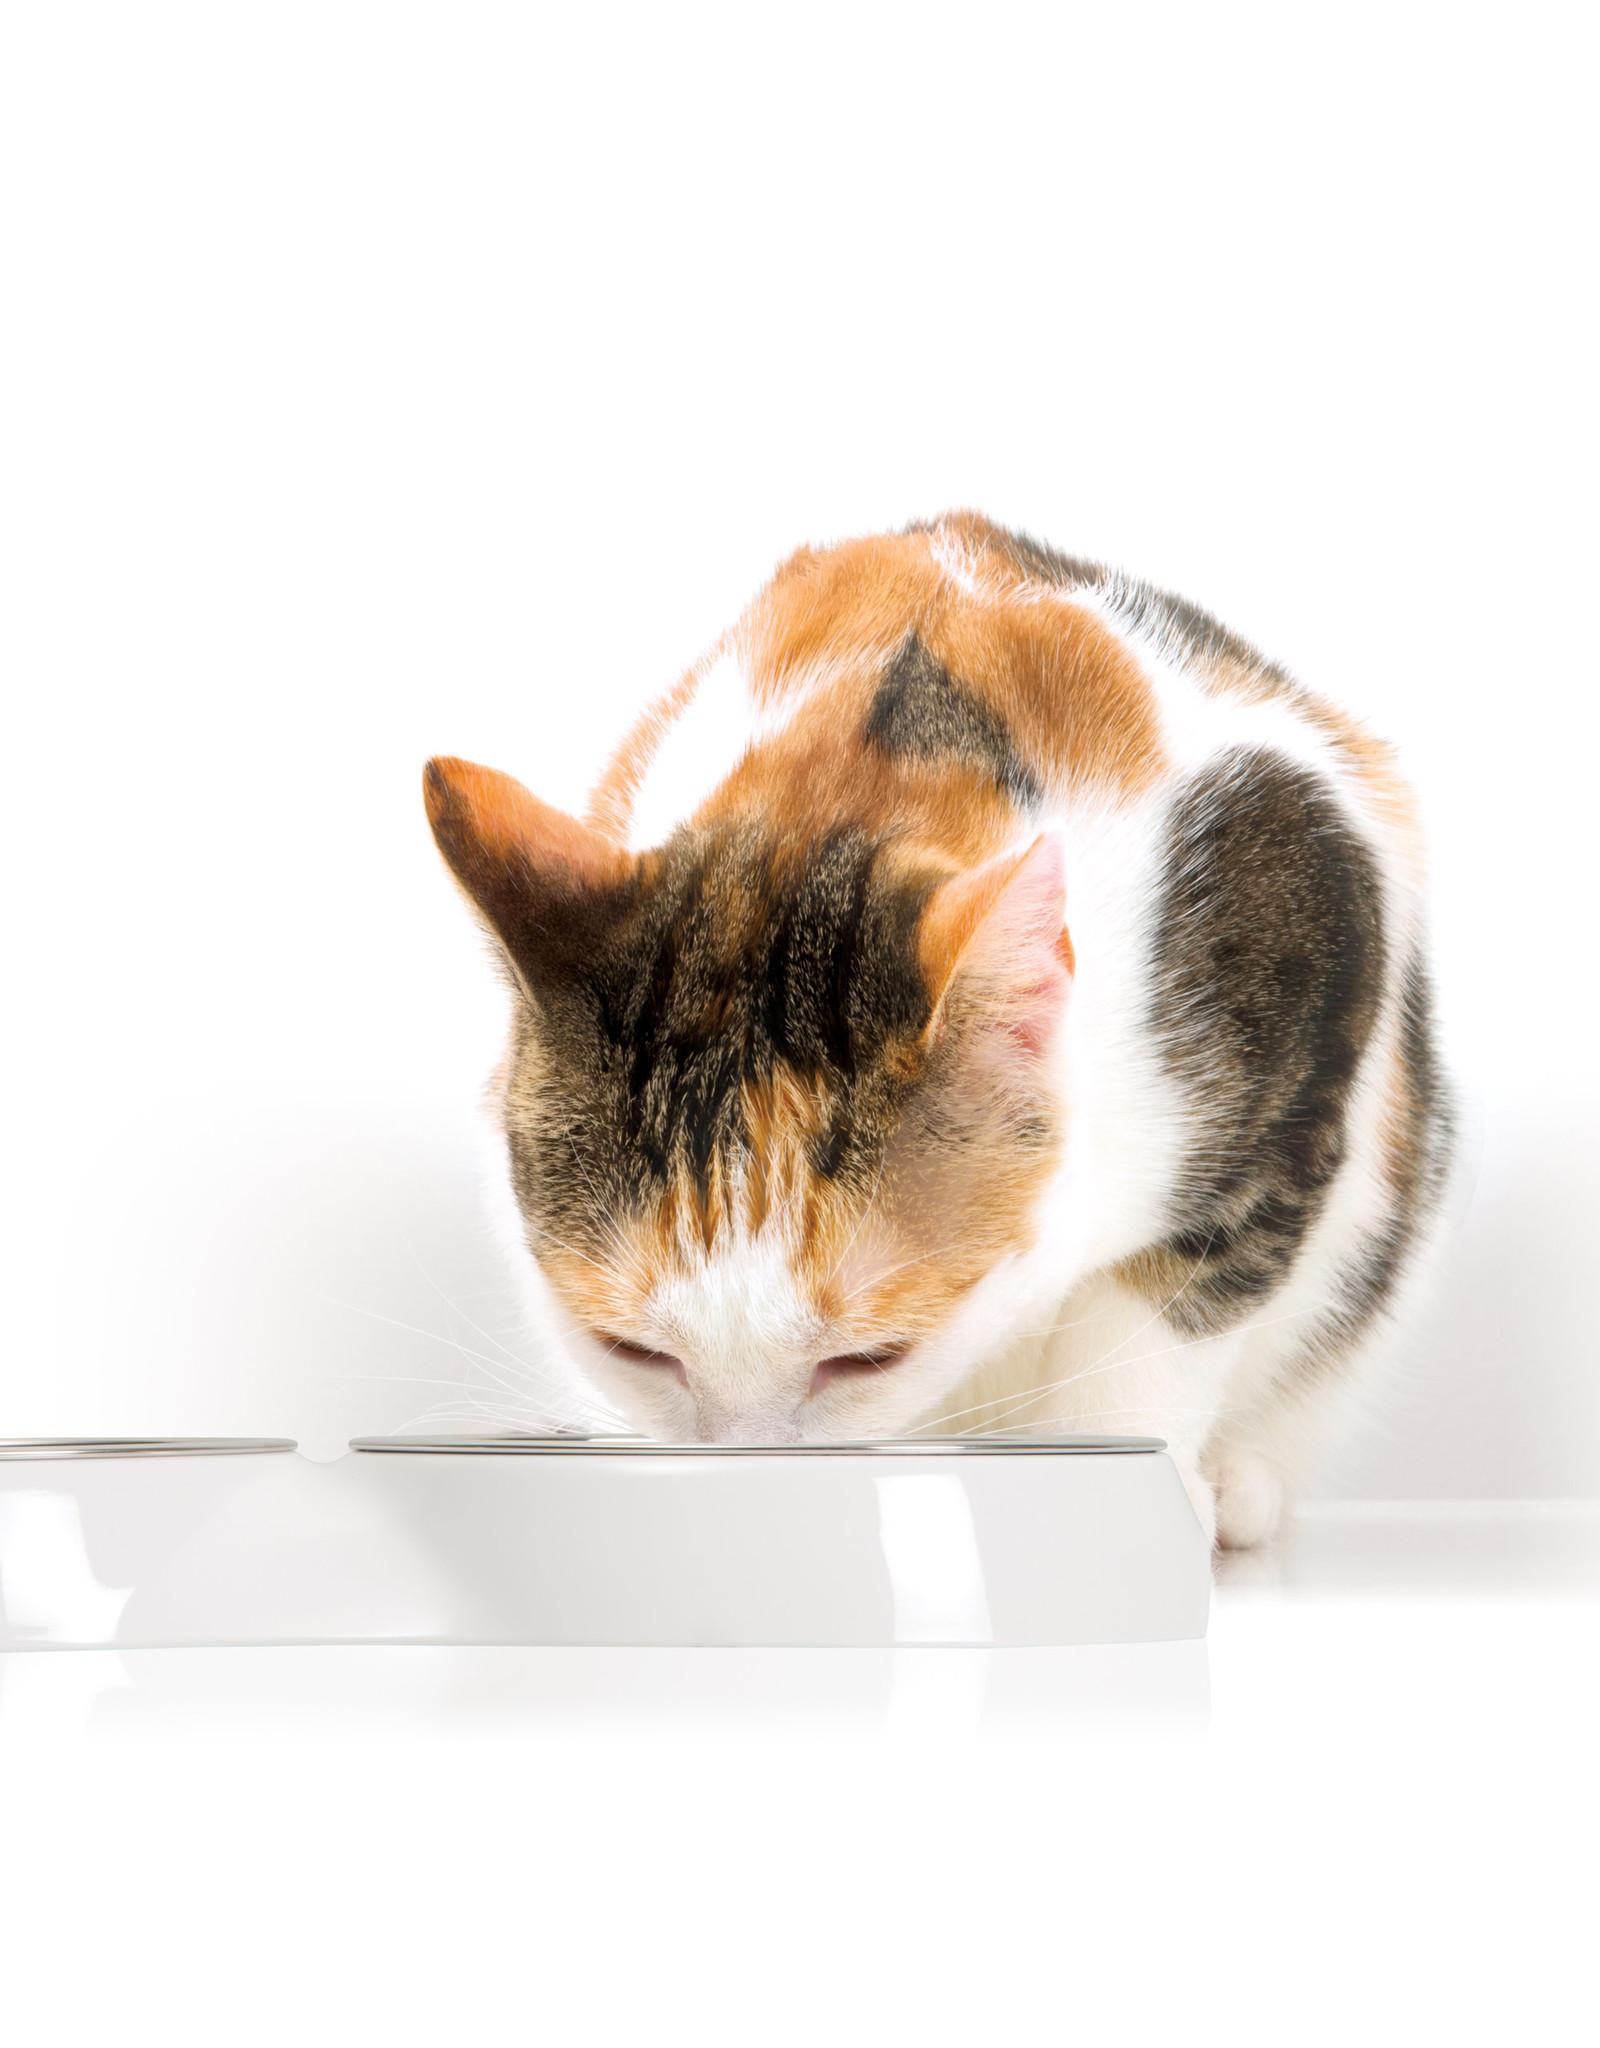 CT - Catit 2.0 Catit Feeding Double Dish - White - 2 x 200 ml (6.83 fl oz)